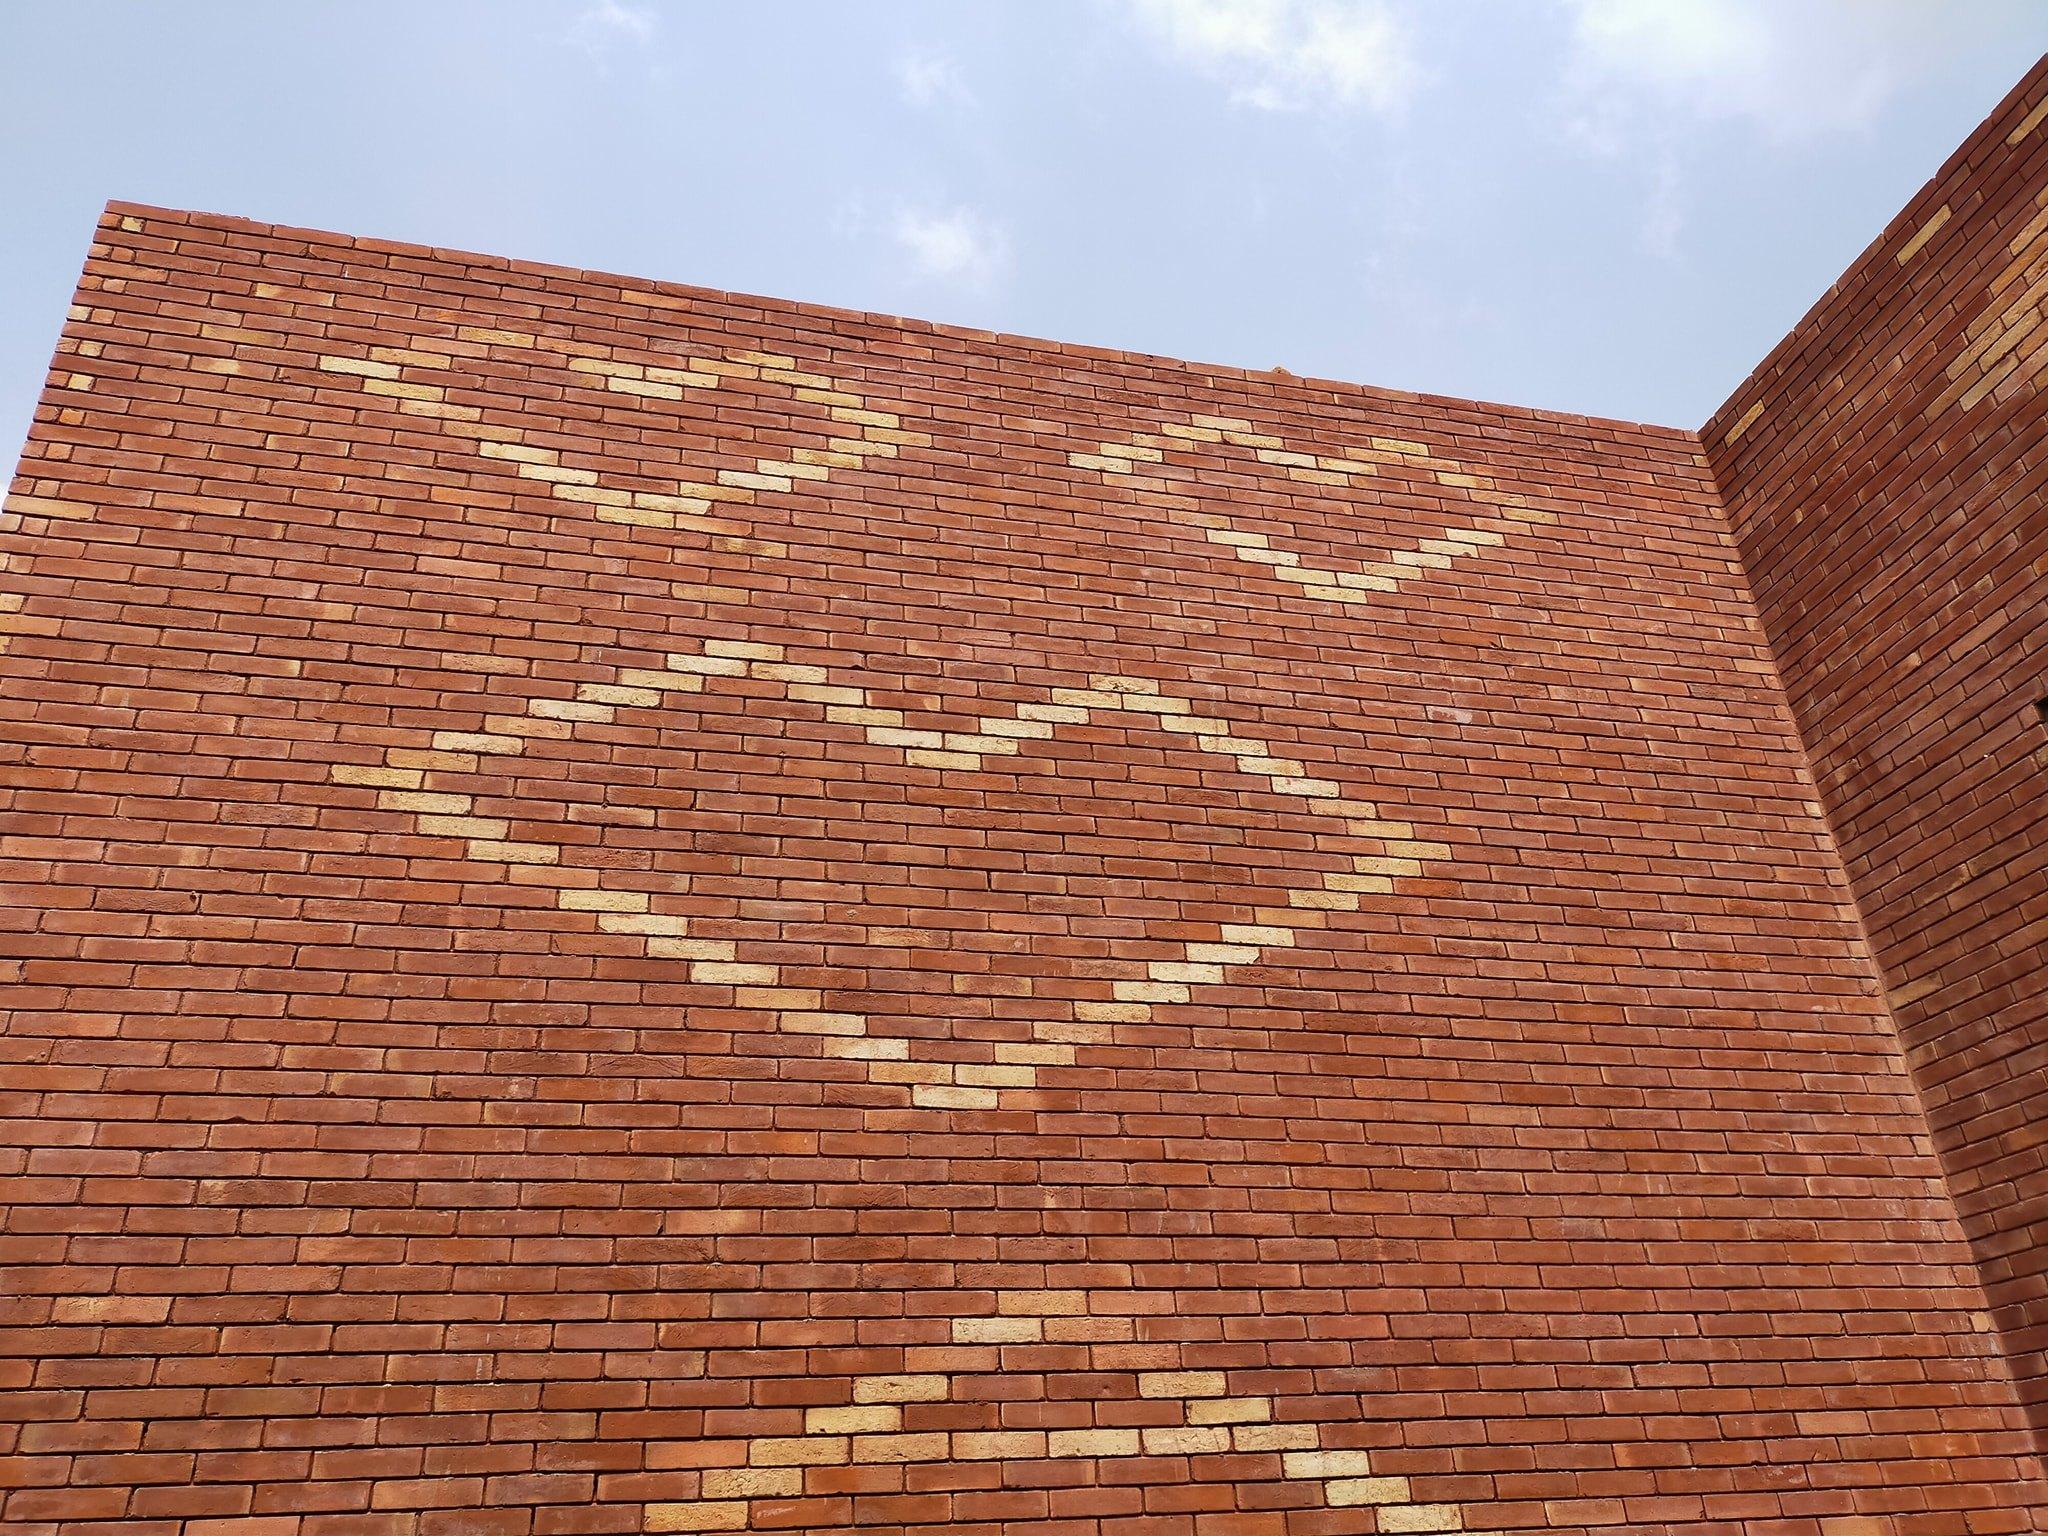 10 Lahori gutka bricks face tiles texture in pakistan